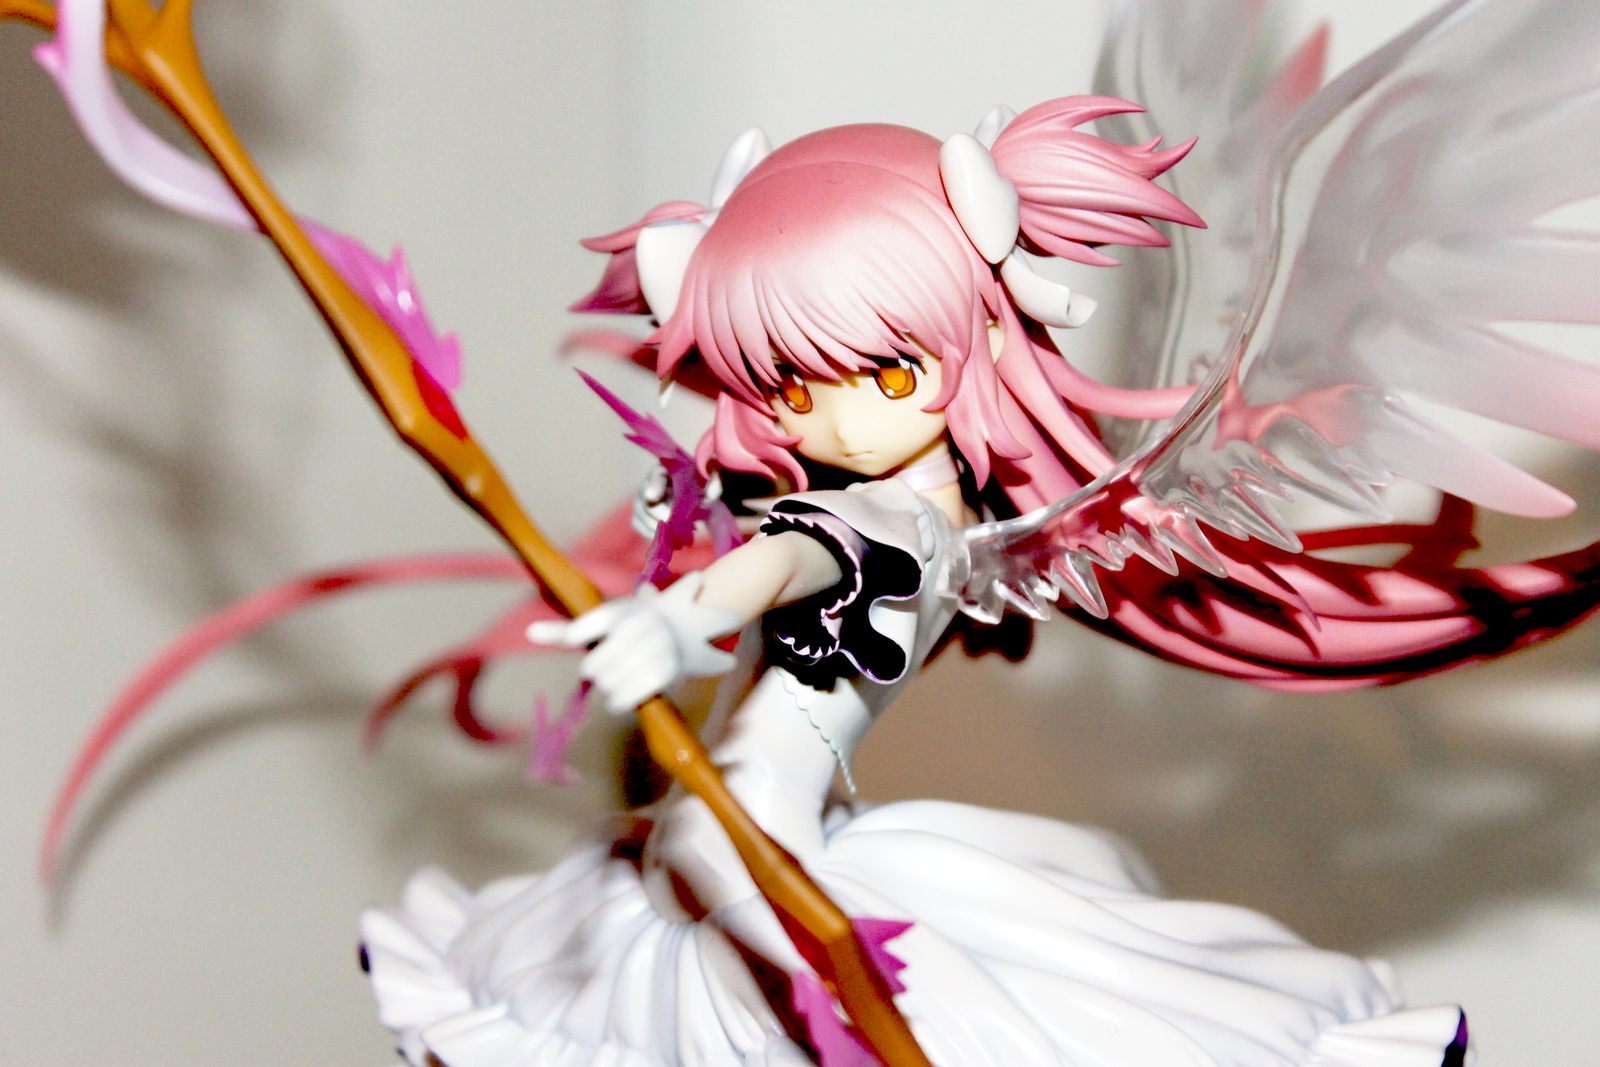 Puella Magi Madoka Magica Goddess PVC Figure By Kekesemporium